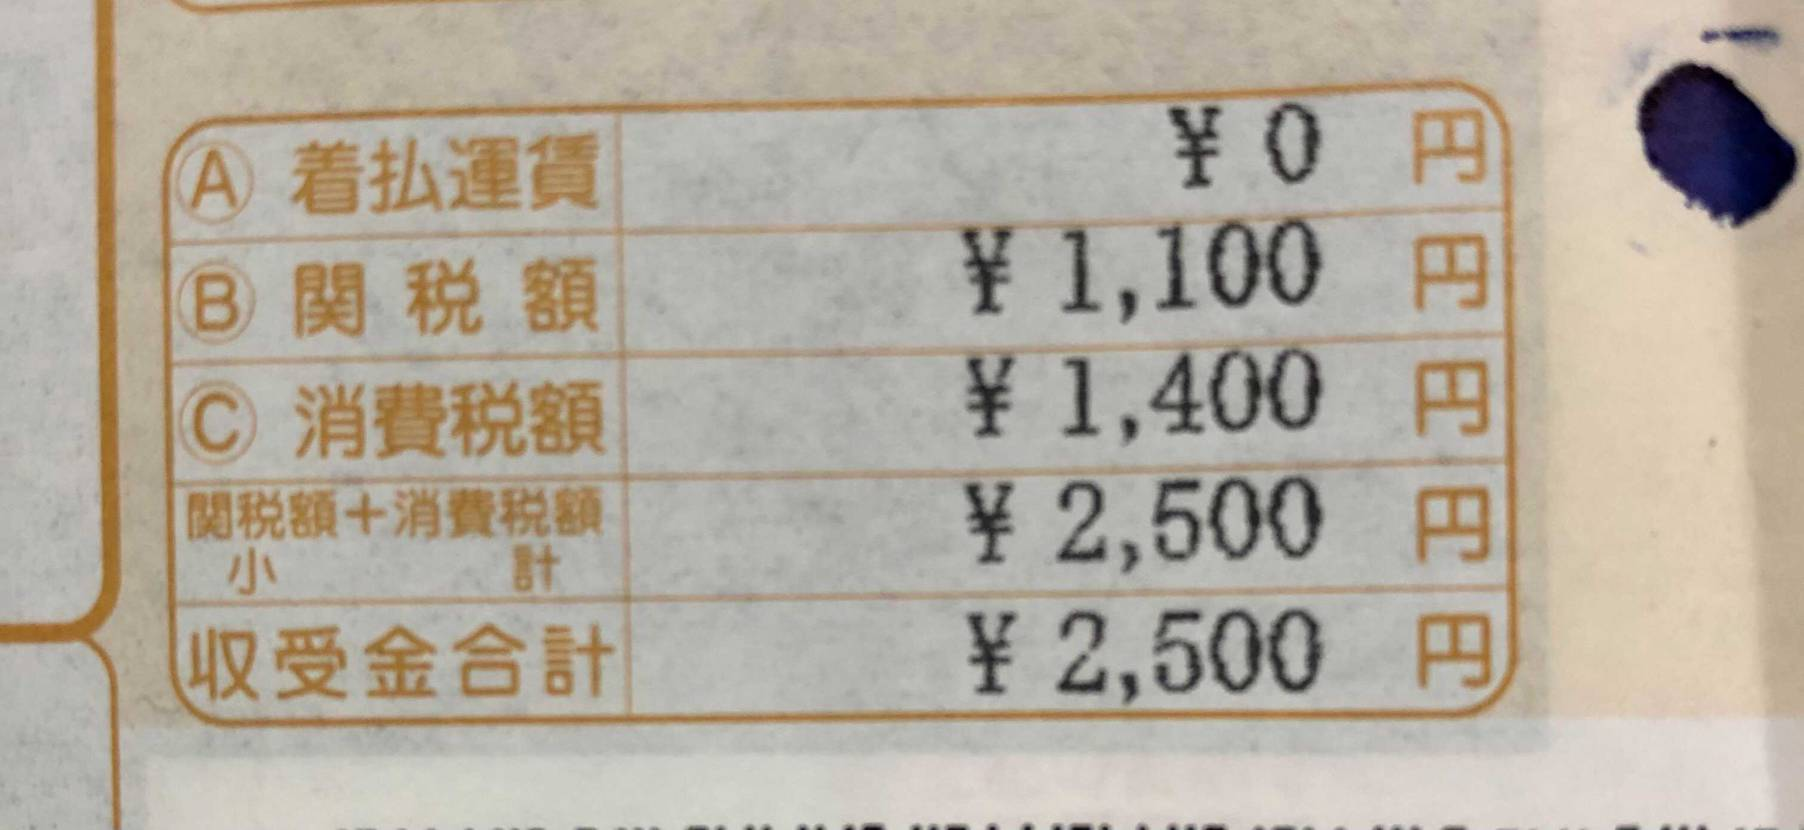 Stockから到着。 とてもカッコ良い。 関税は2500円でした。